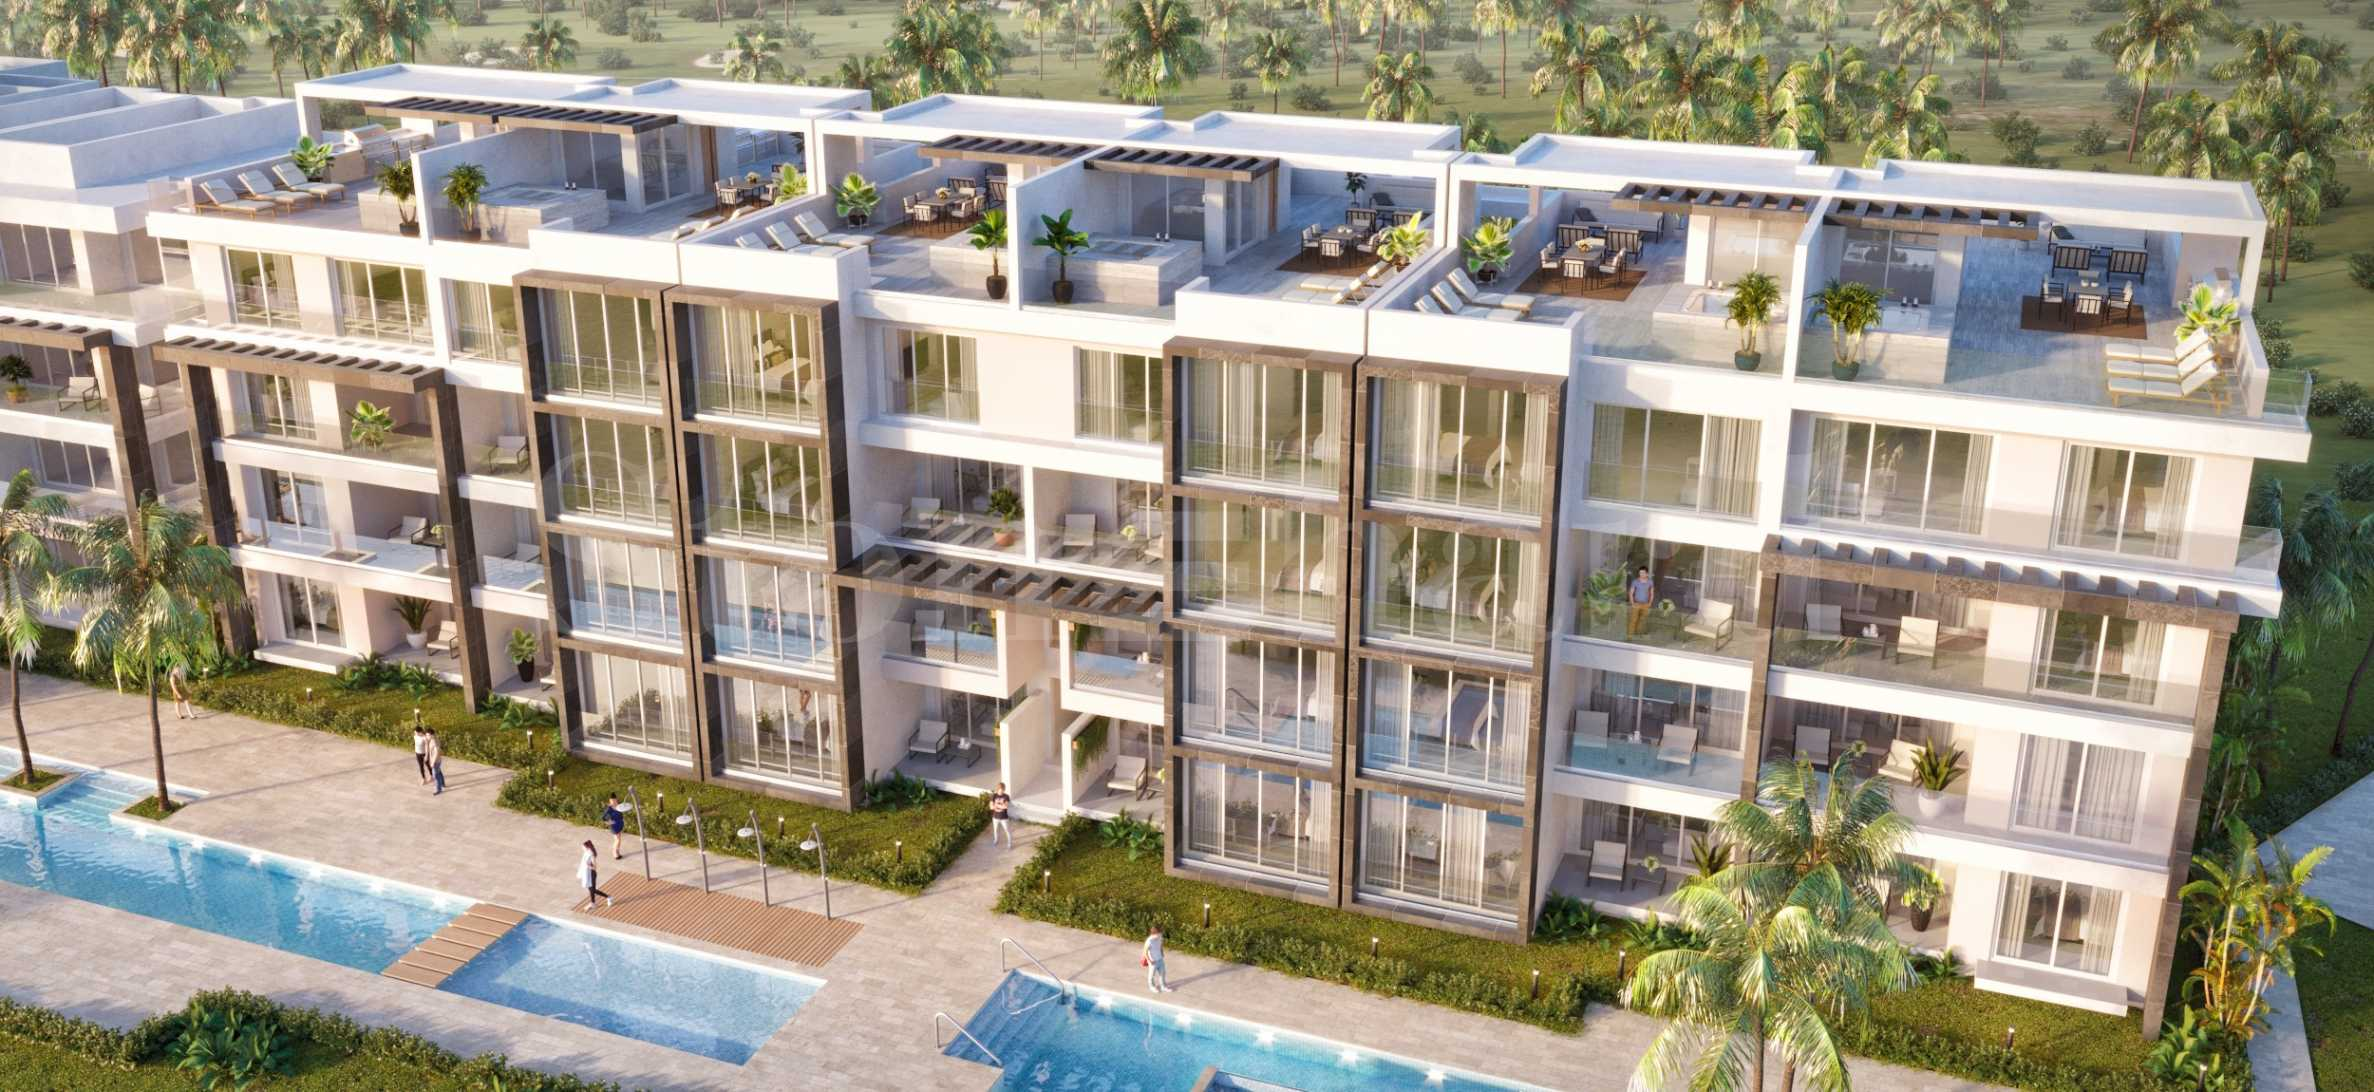 First class luxury development on the Bavaro beach, Punta Cana2 - Stonehard